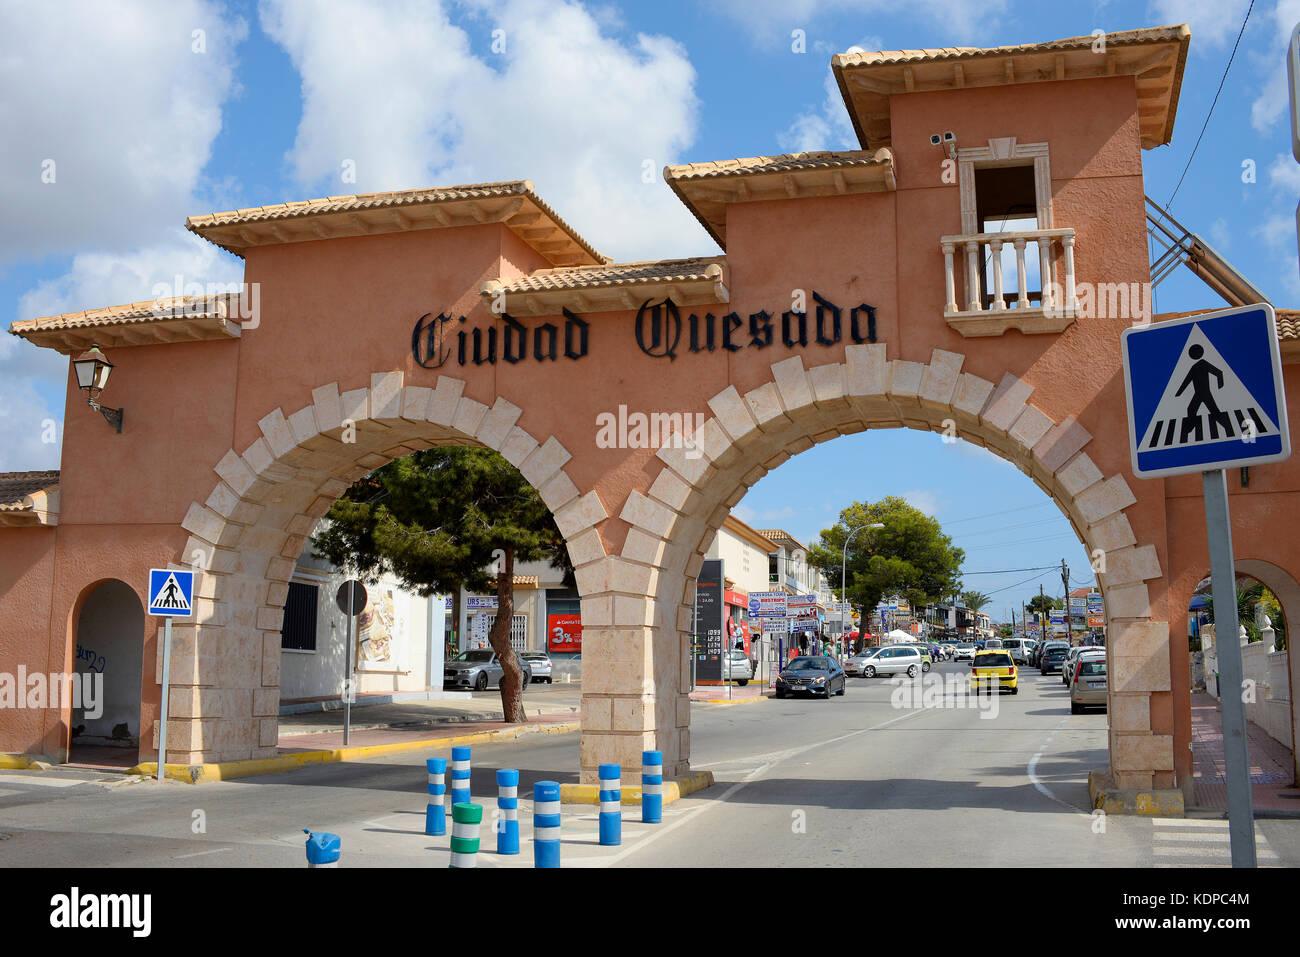 Street Map Of Quesada Spain.Ciudad Quesada Stock Photos Ciudad Quesada Stock Images Alamy